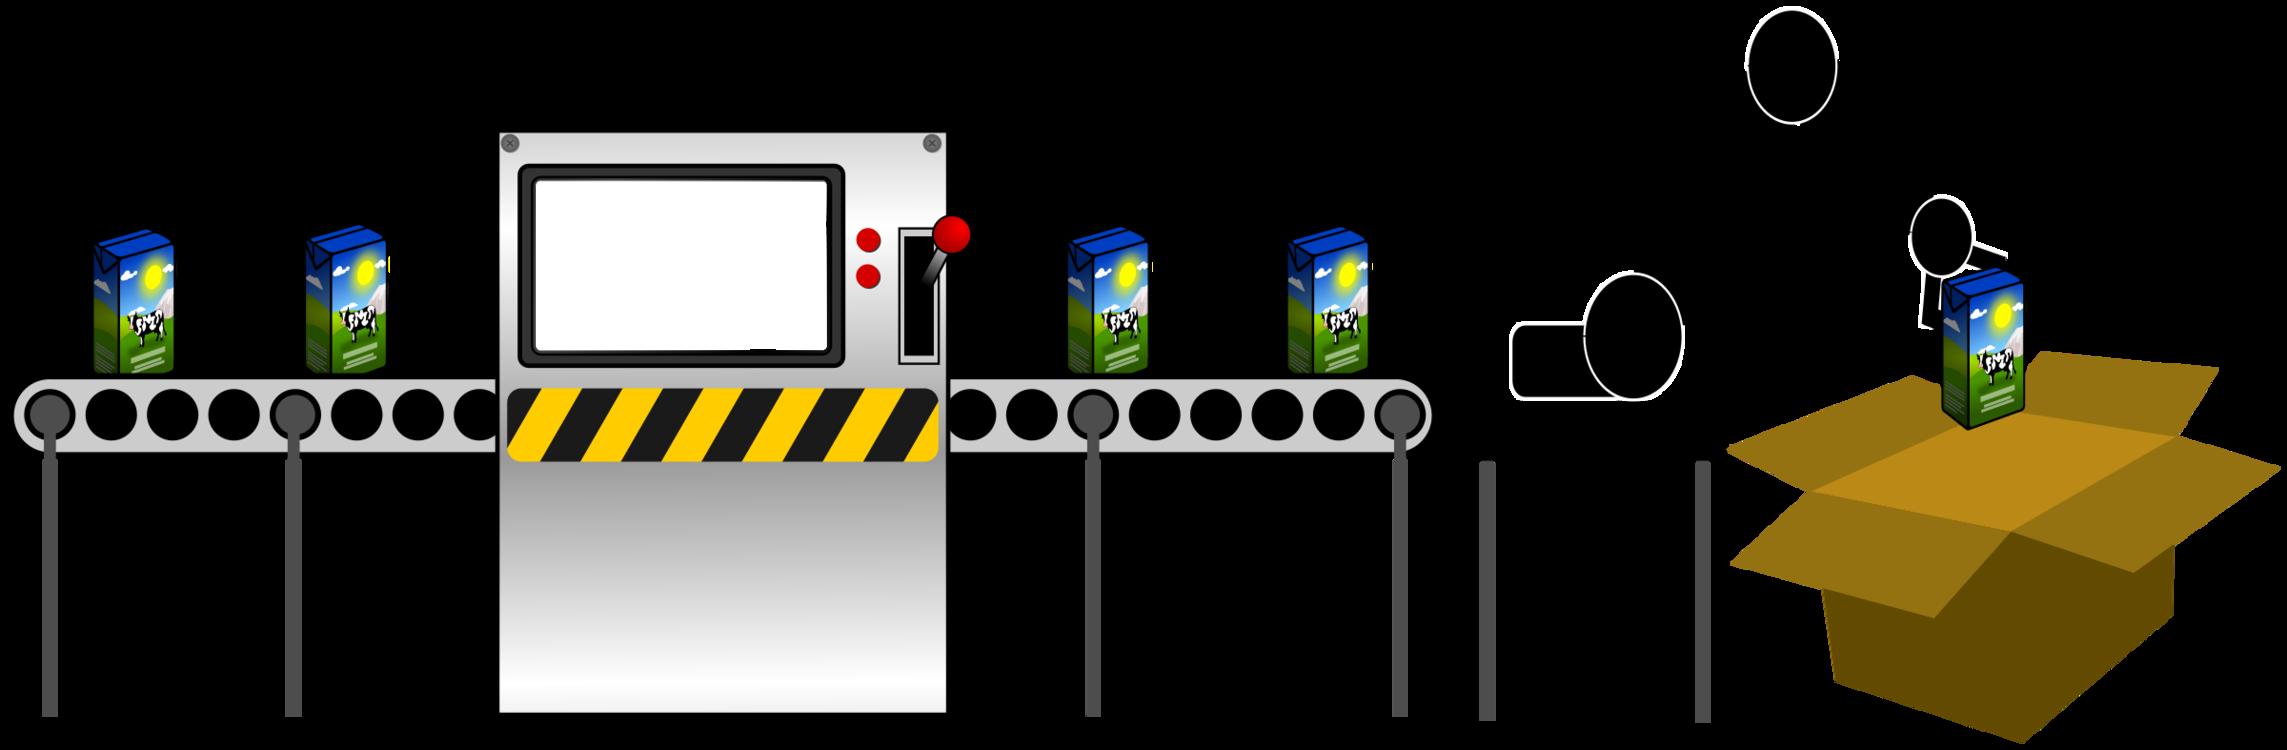 free download Conveyor system Conveyor belt Factory Assembly line Production line